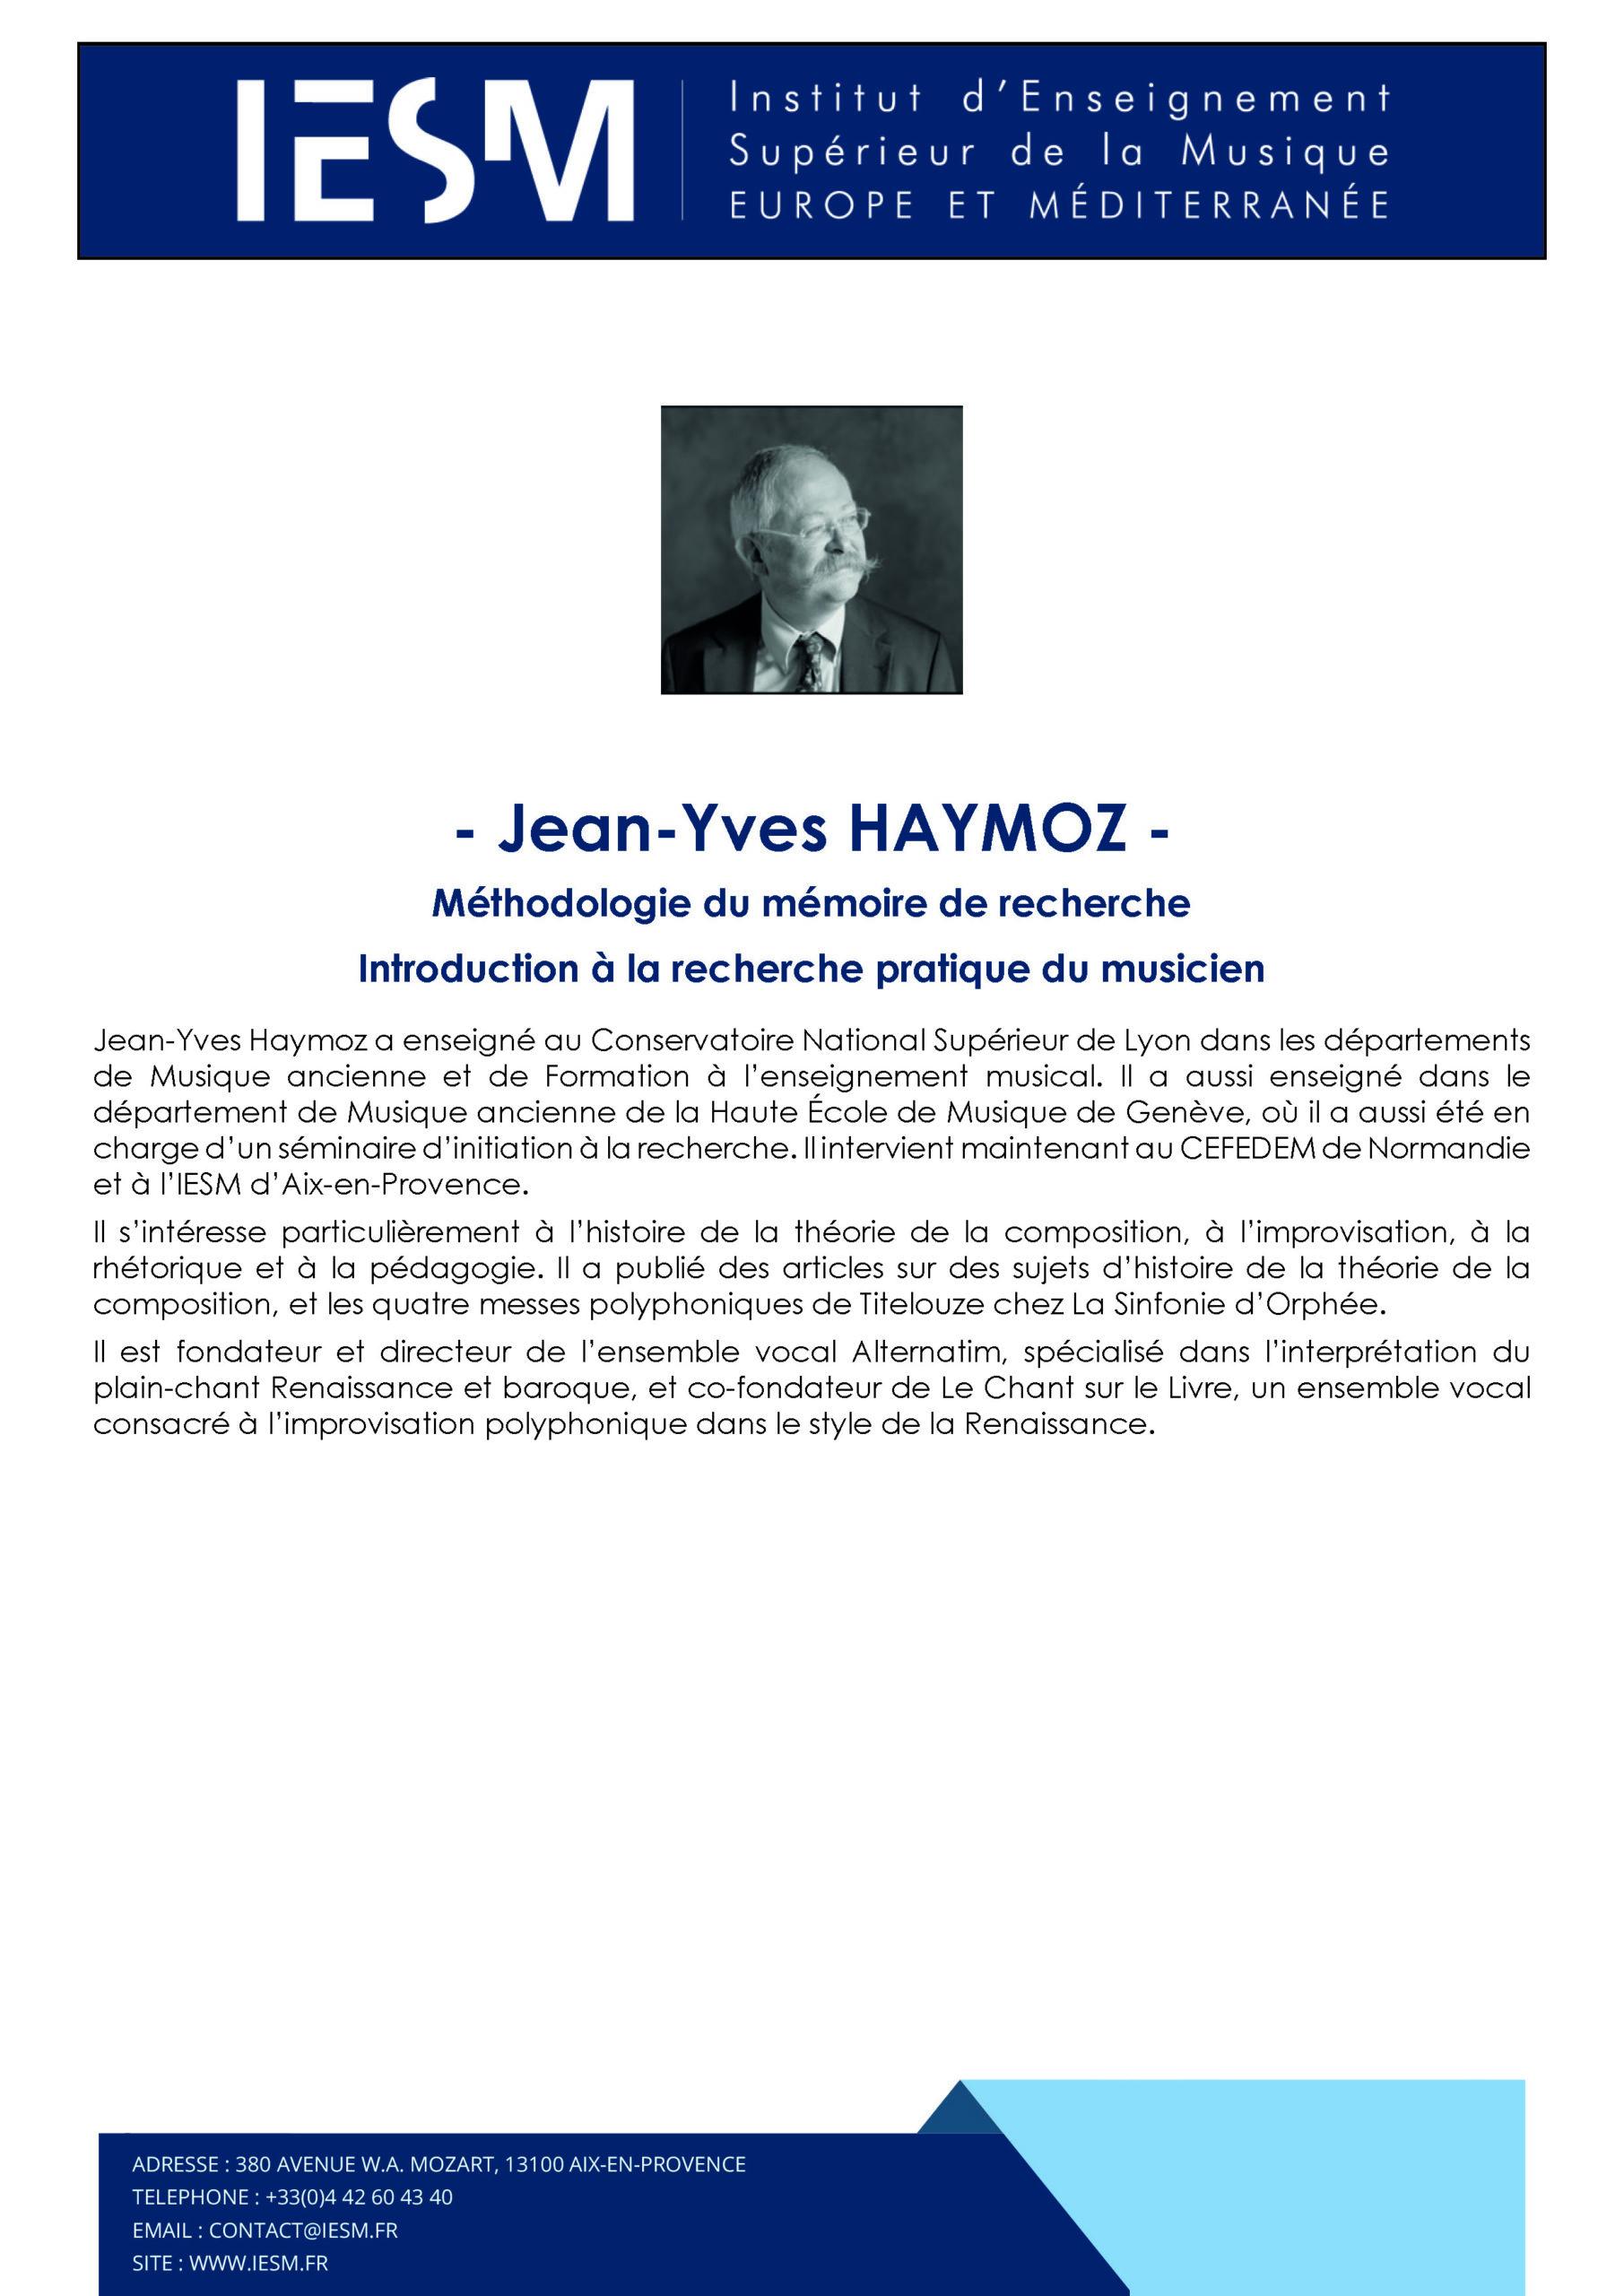 HAYMOZ Jean Yves scaled